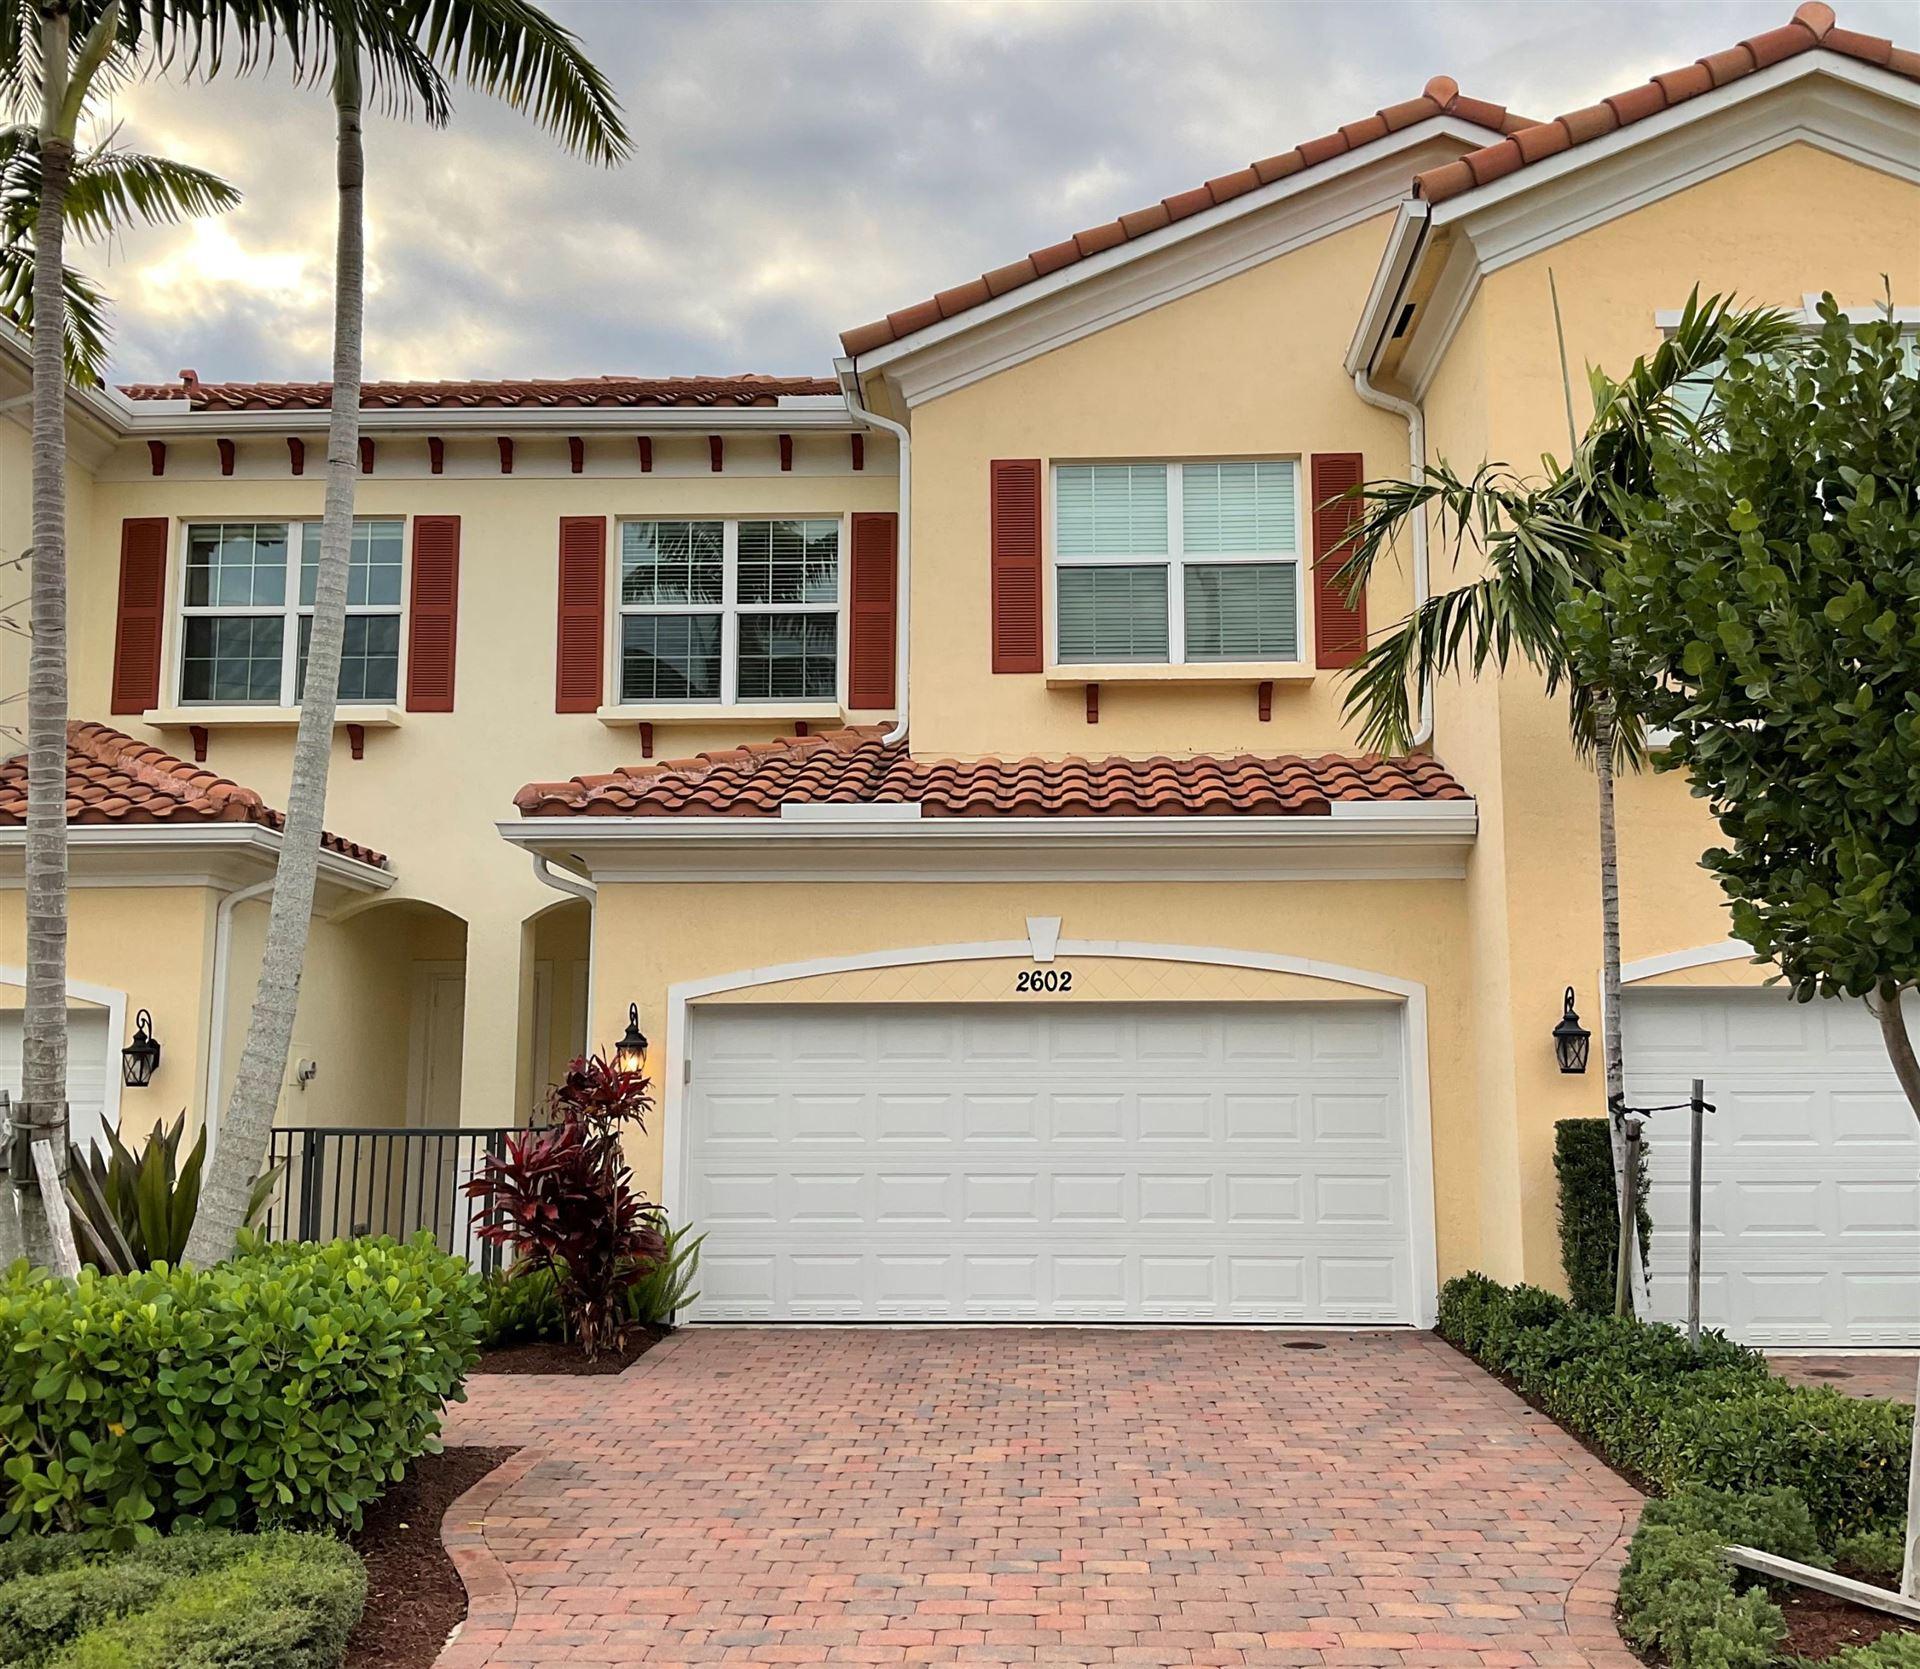 Photo of 2602 Florida Boulevard, Delray Beach, FL 33483 (MLS # RX-10695217)